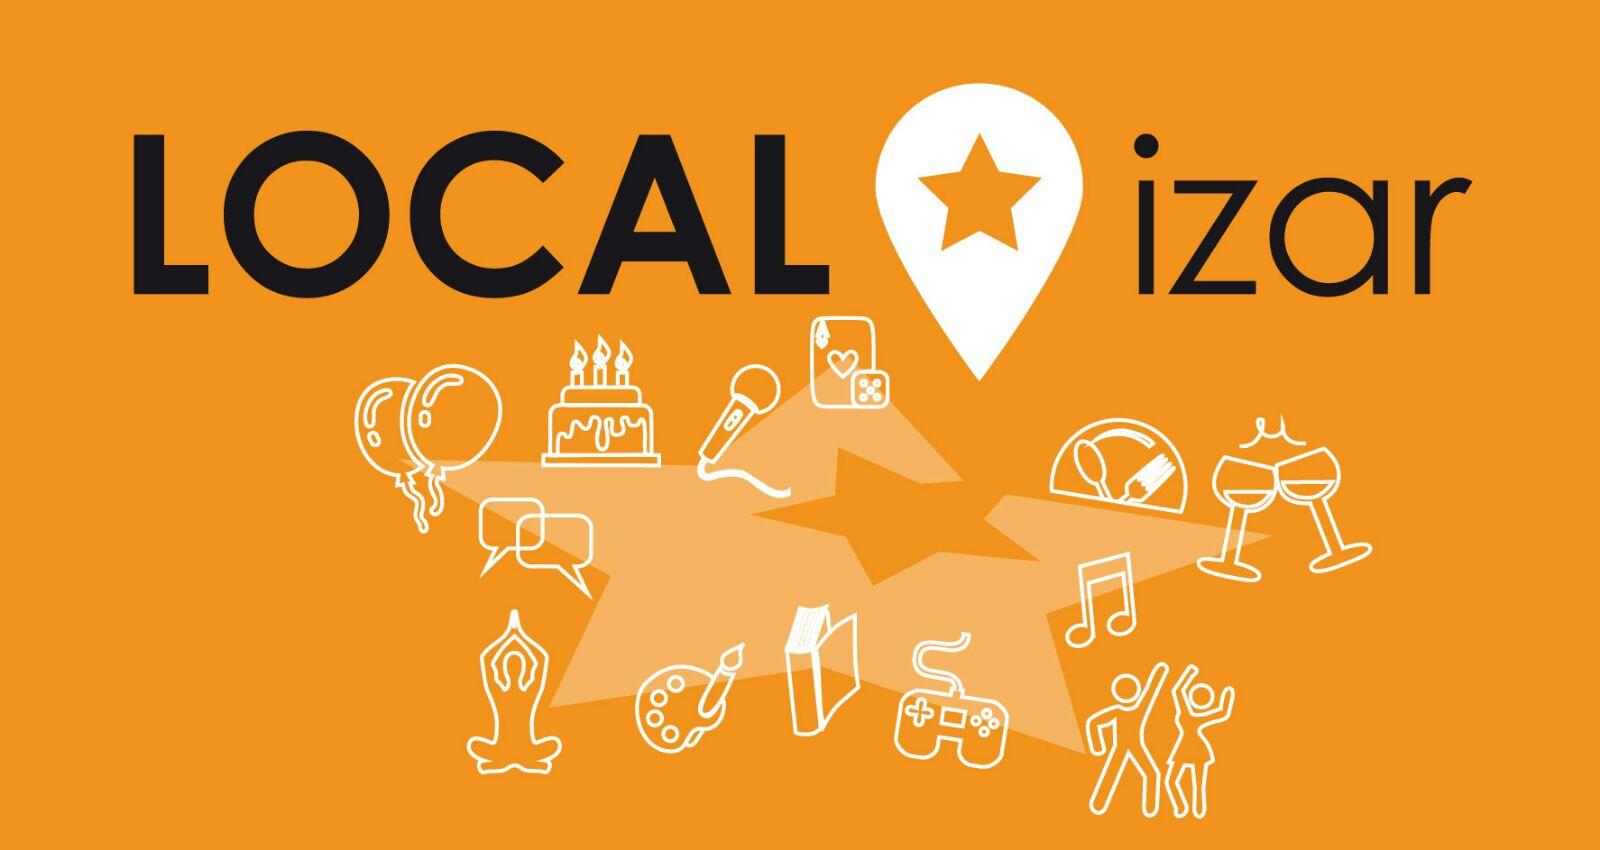 LOCAL-IZAR